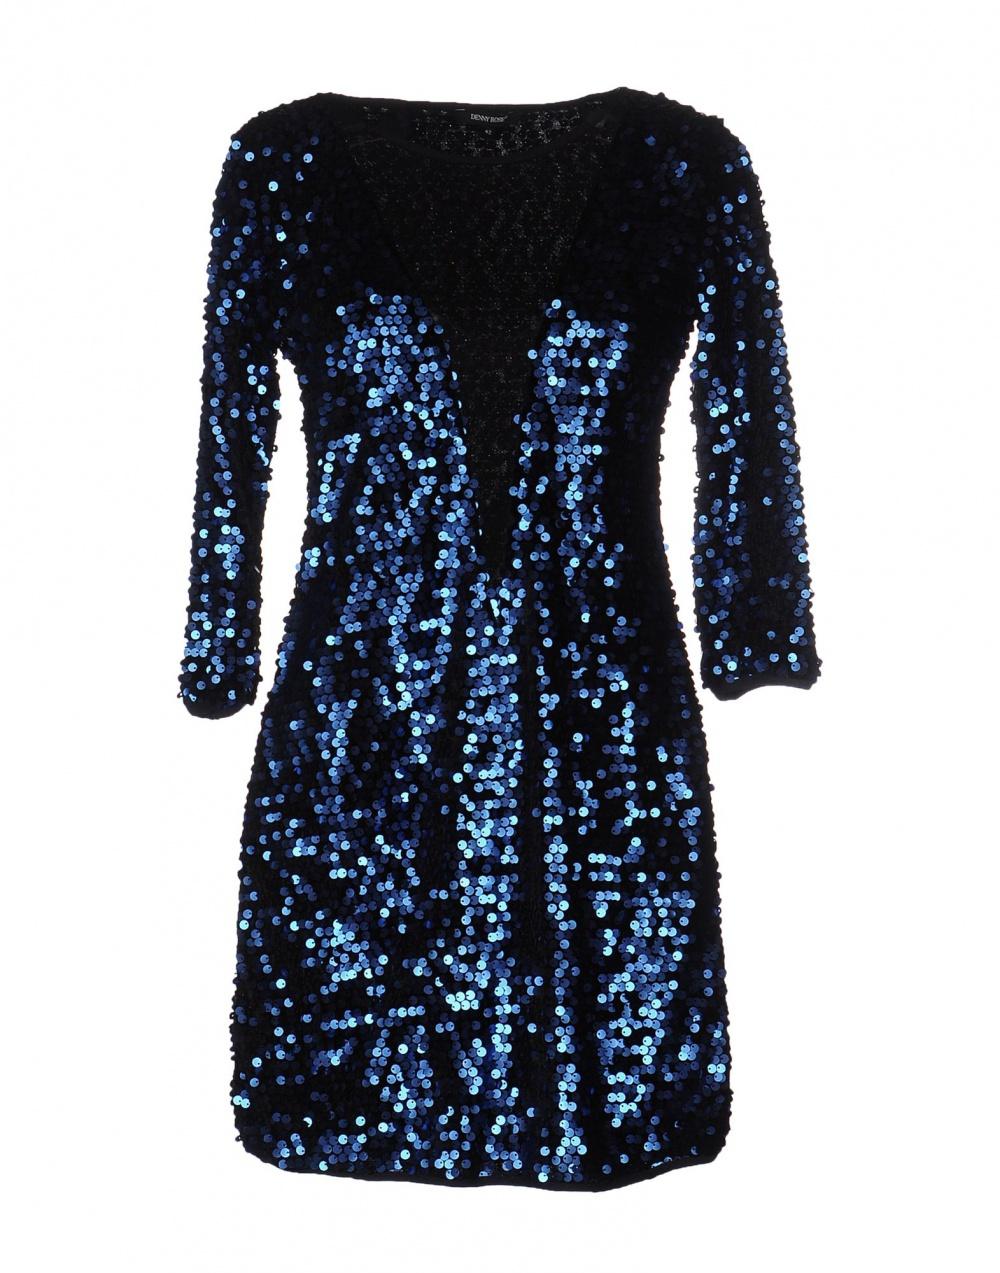 Платье Denny Rose, размер 40 (xs, s)